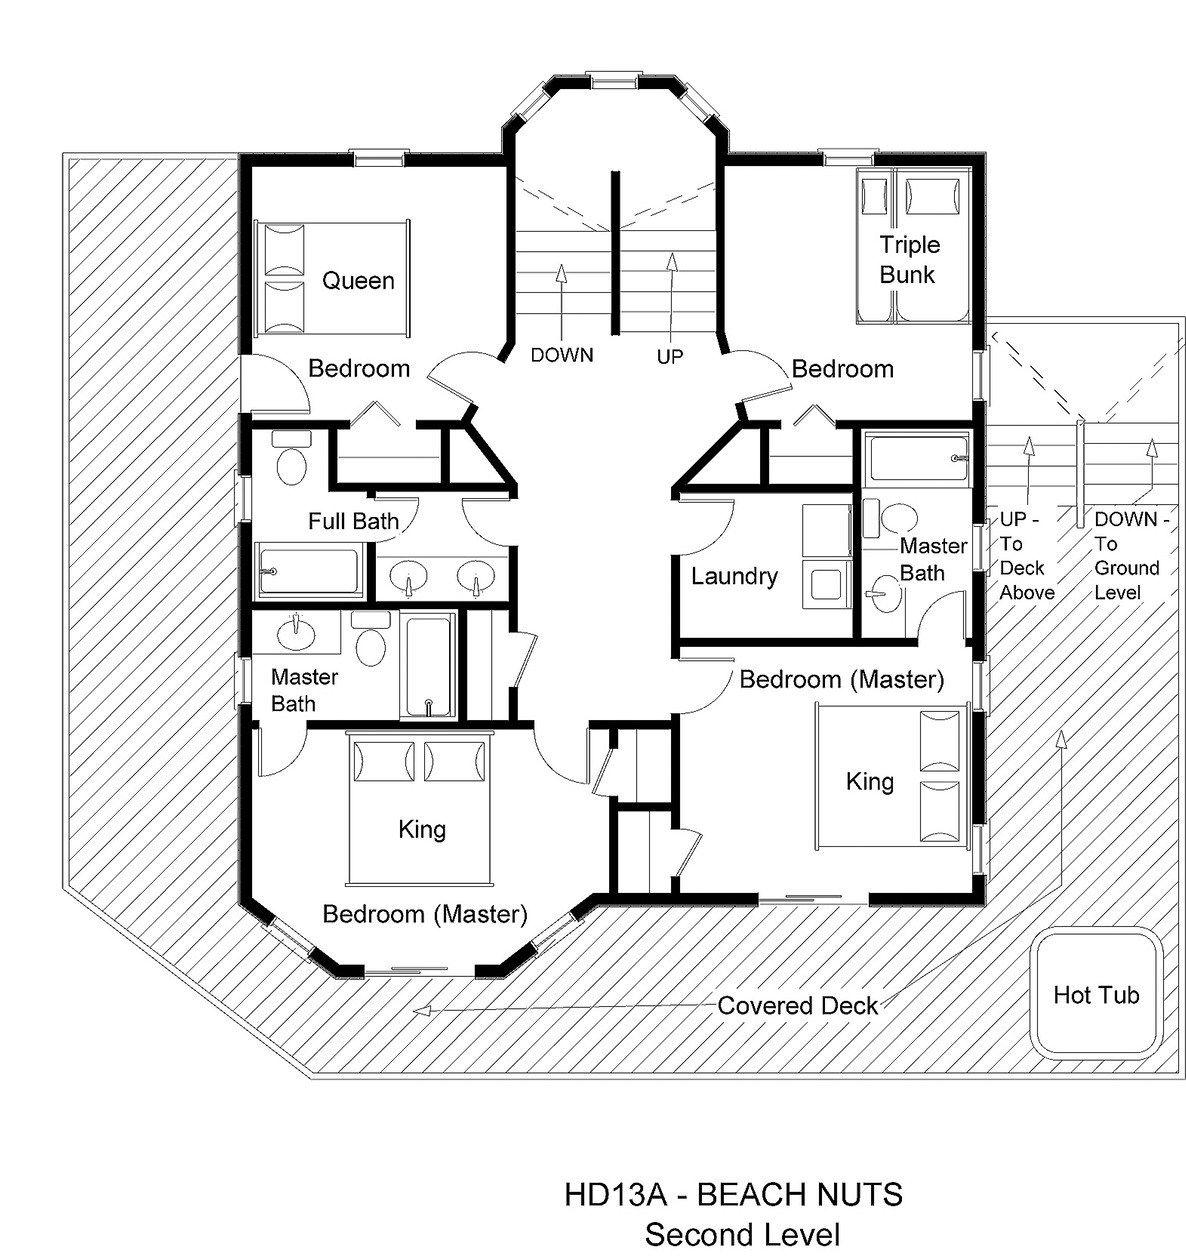 Floor Plan Craftsman Style Home Plans Ranch House Metal Homes Floor Leroux Brick Ranch Home Plan Affordable House Plans New House Plans Beach House Floor Plans